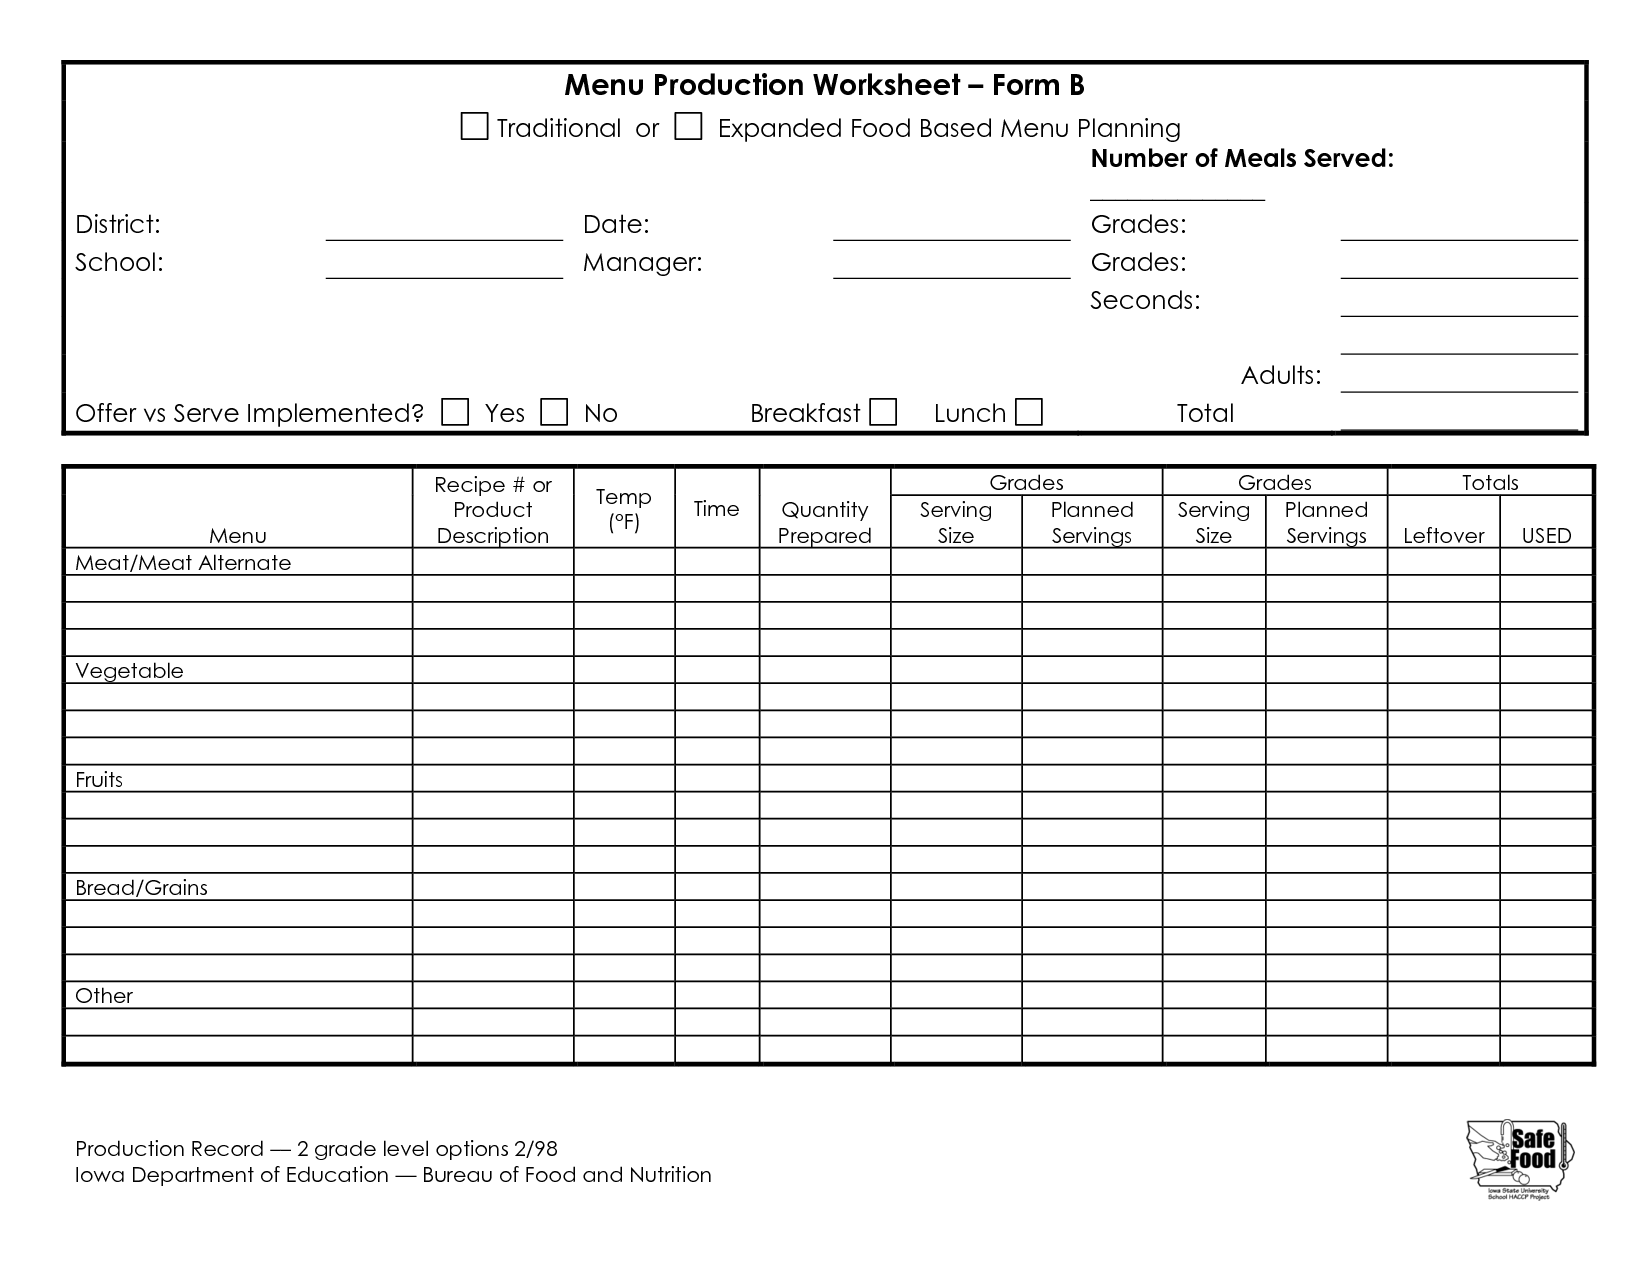 Production Worksheet Blank